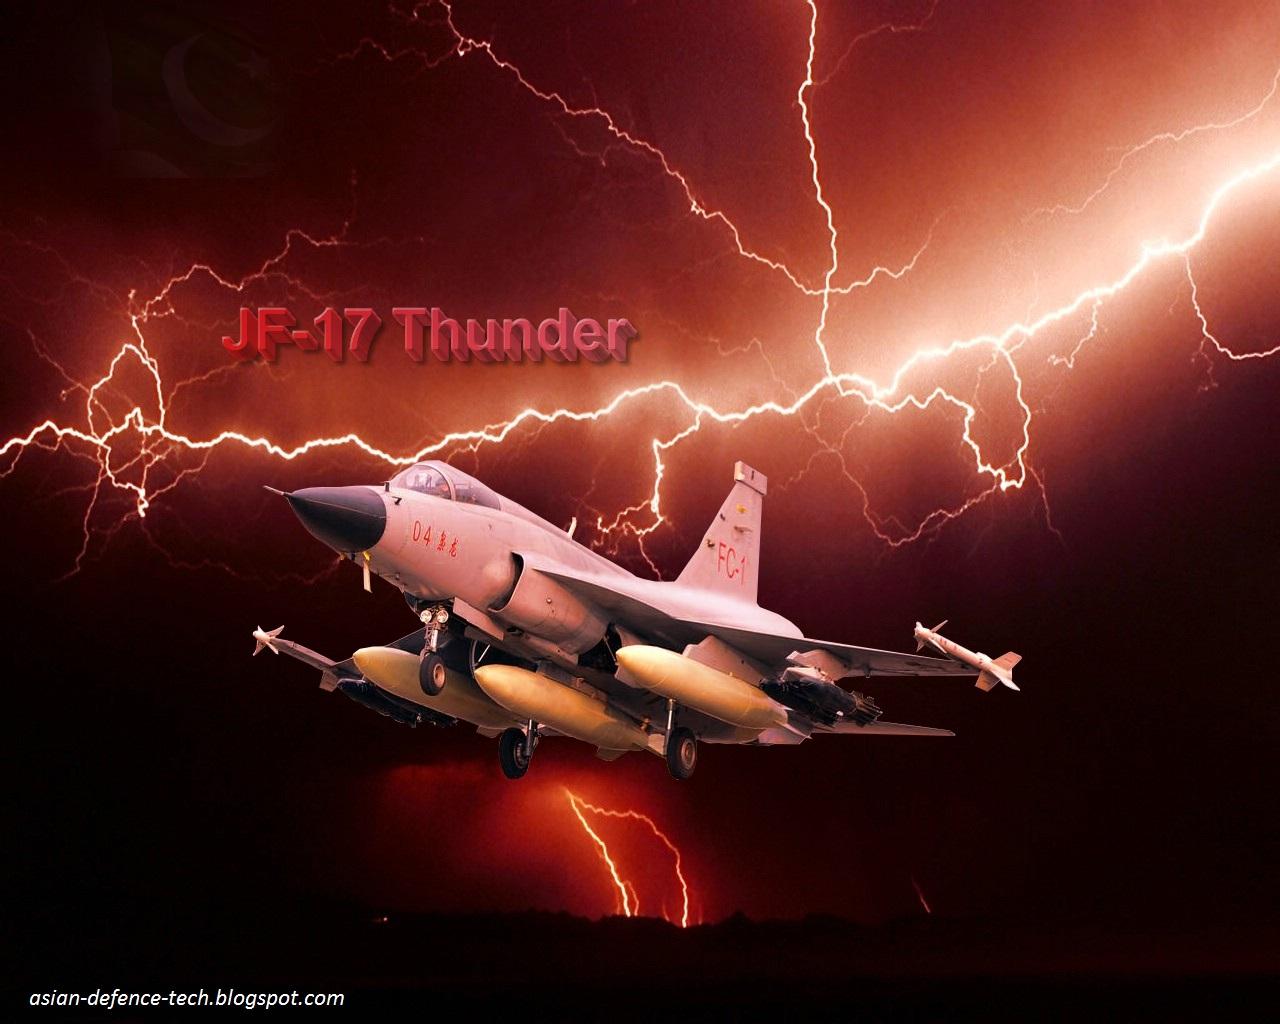 http://4.bp.blogspot.com/-WArnX7_hJsI/Ttx8sMU_1WI/AAAAAAAACnY/gB7sMsliMiM/s1600/asian+defence+jf-17+thunder.jpg